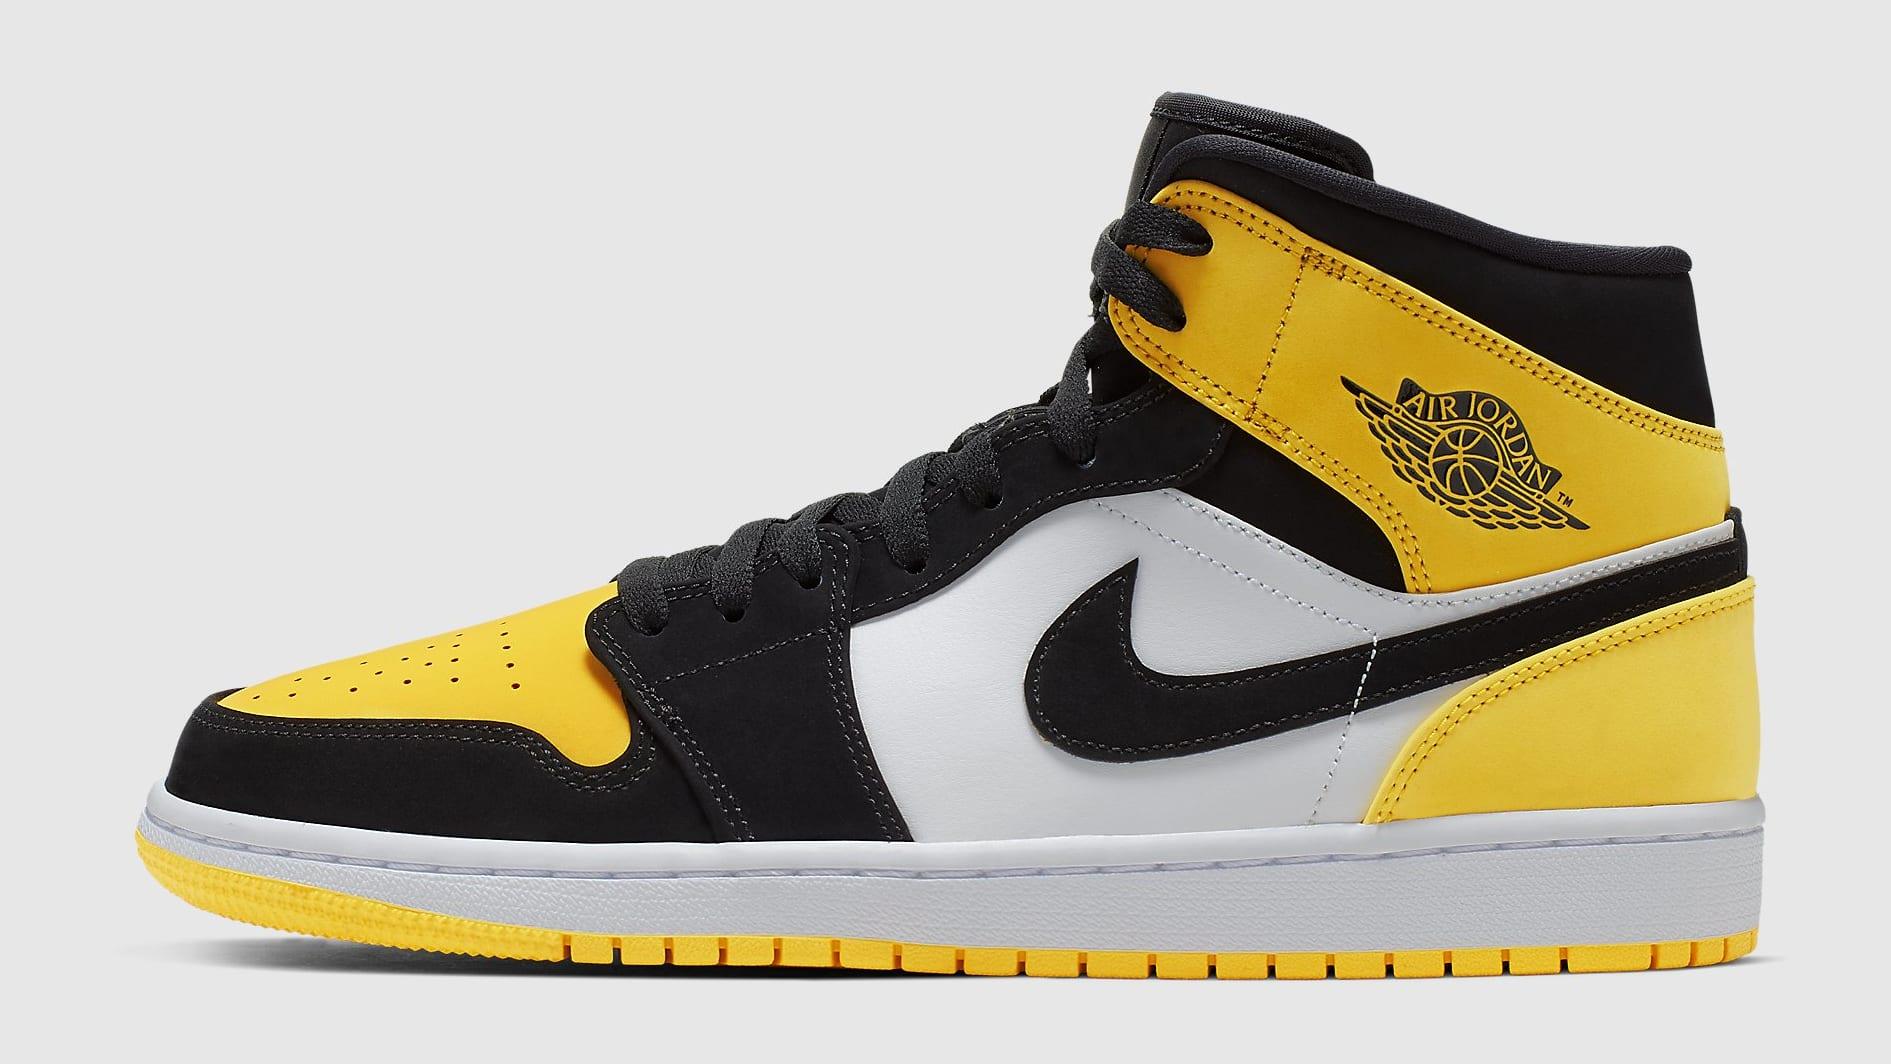 online store 2c745 b5bc0 Air Jordan 1 Mid Yellow Toe Release Date 852542-071 | Sole ...